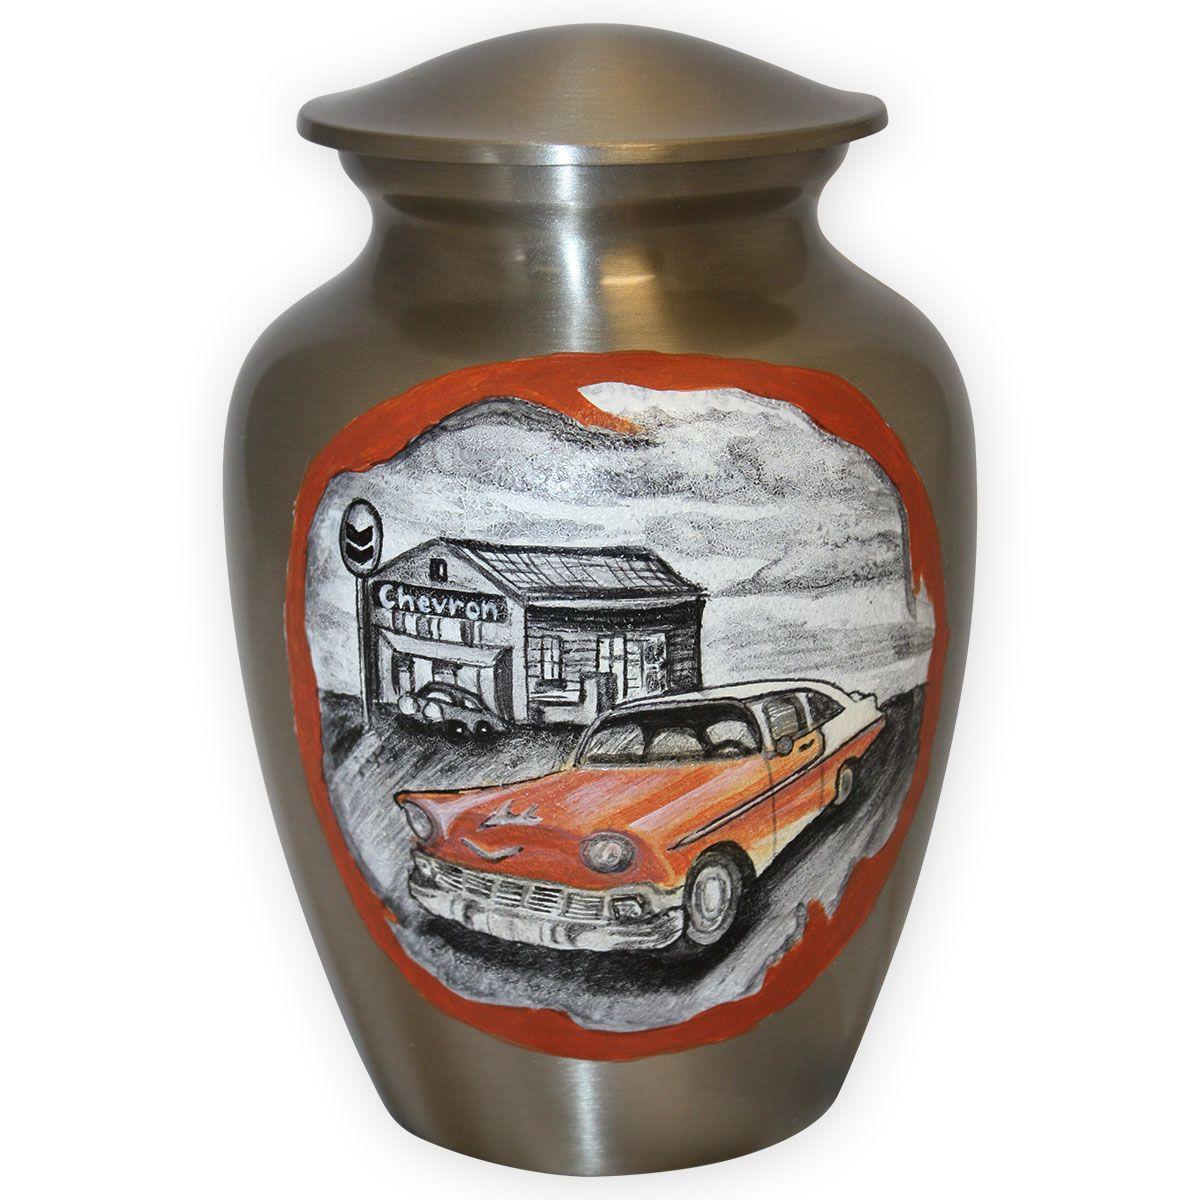 Cremation Urns Beautiful Urns for Ashes Keepsake urns